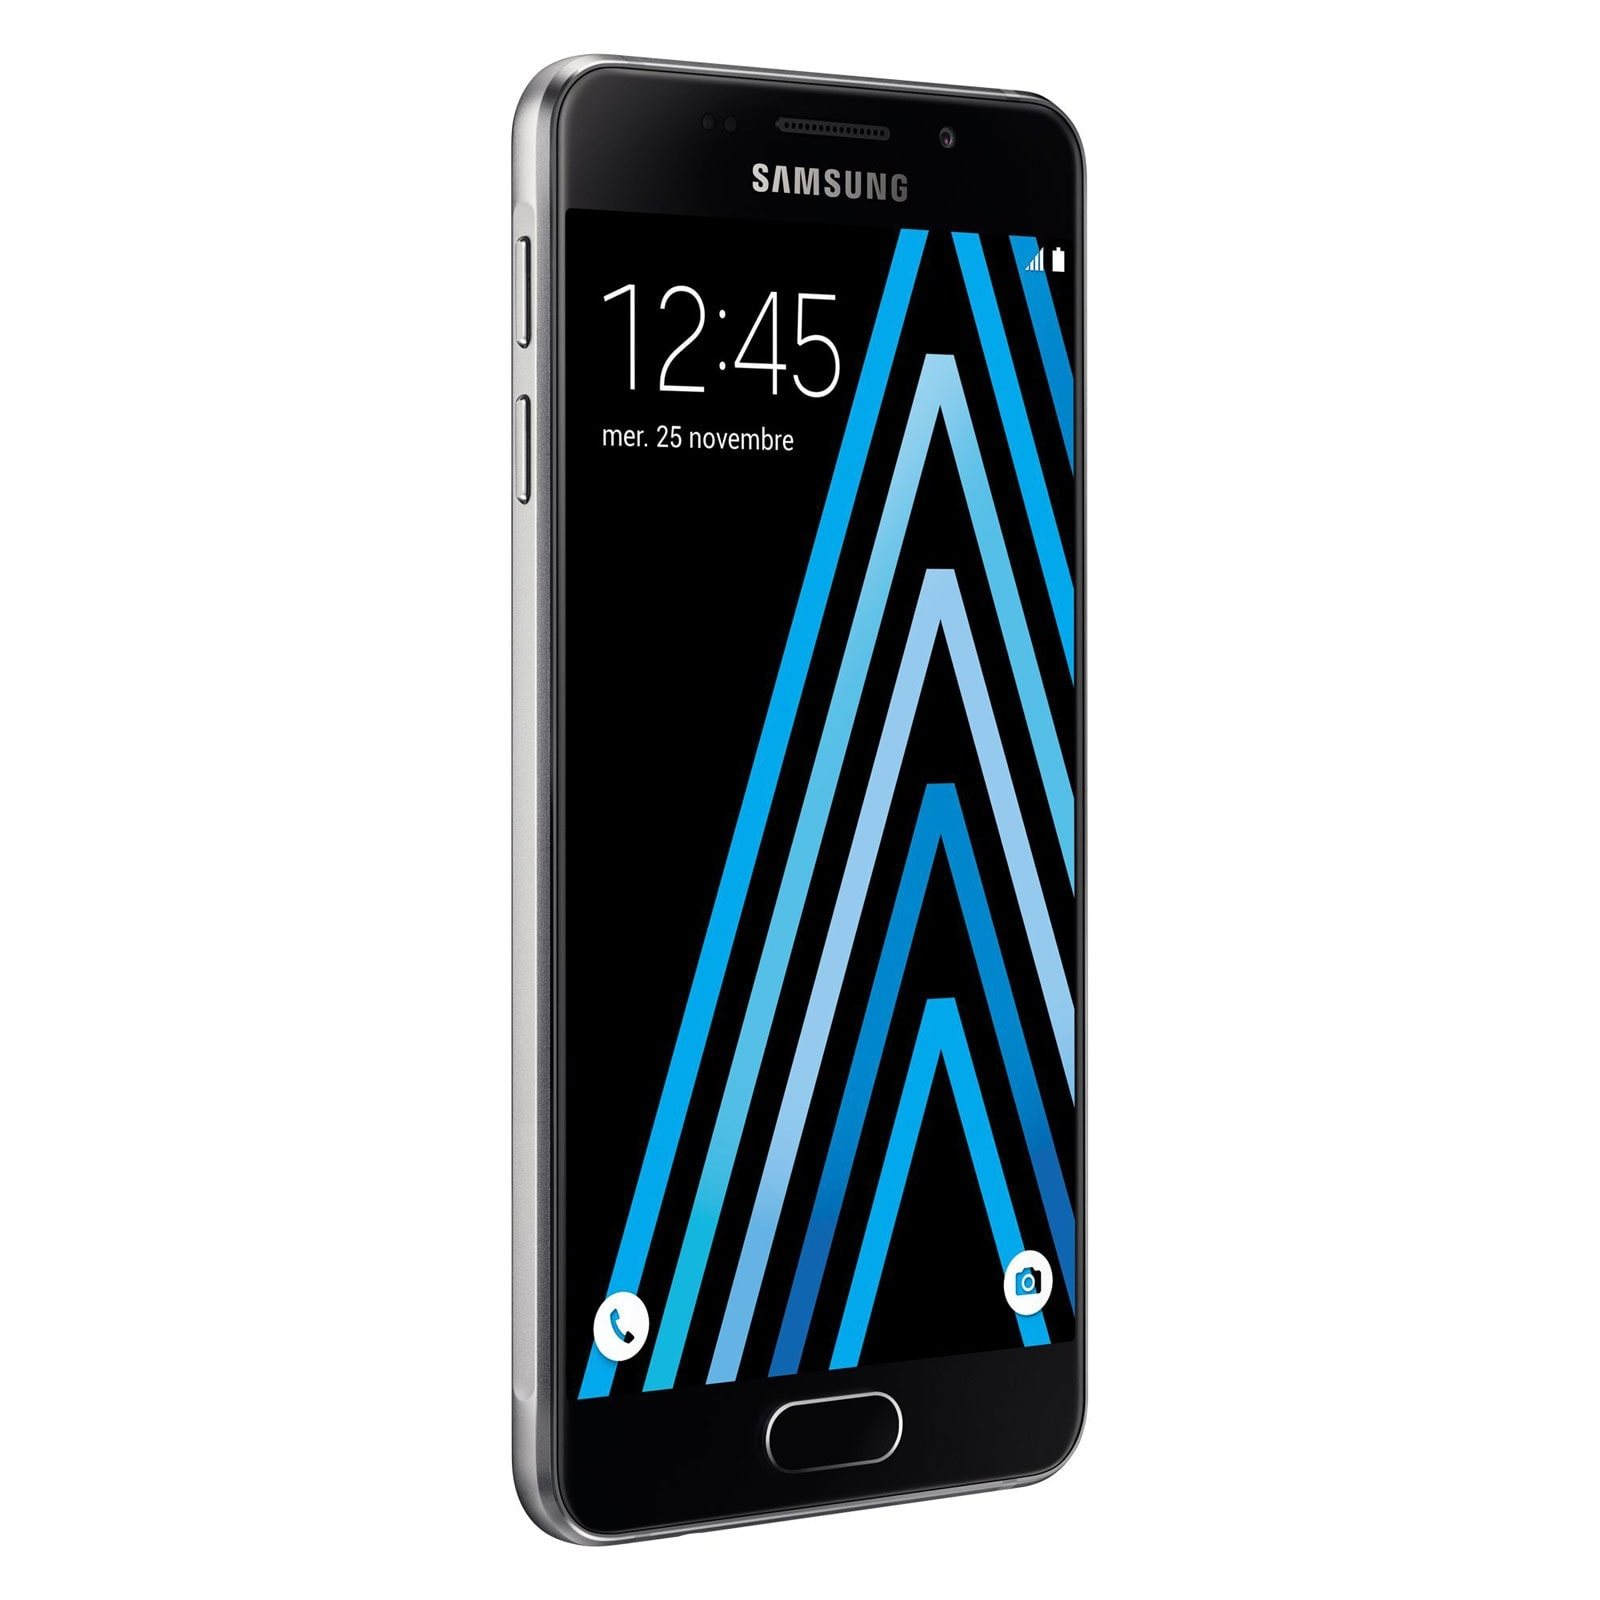 Samsung Galaxy A3 (2016) 16Go A310F Black (SM-A310FZKAXEF) - Achat / Vente Téléphonie sur Cybertek.fr - 0